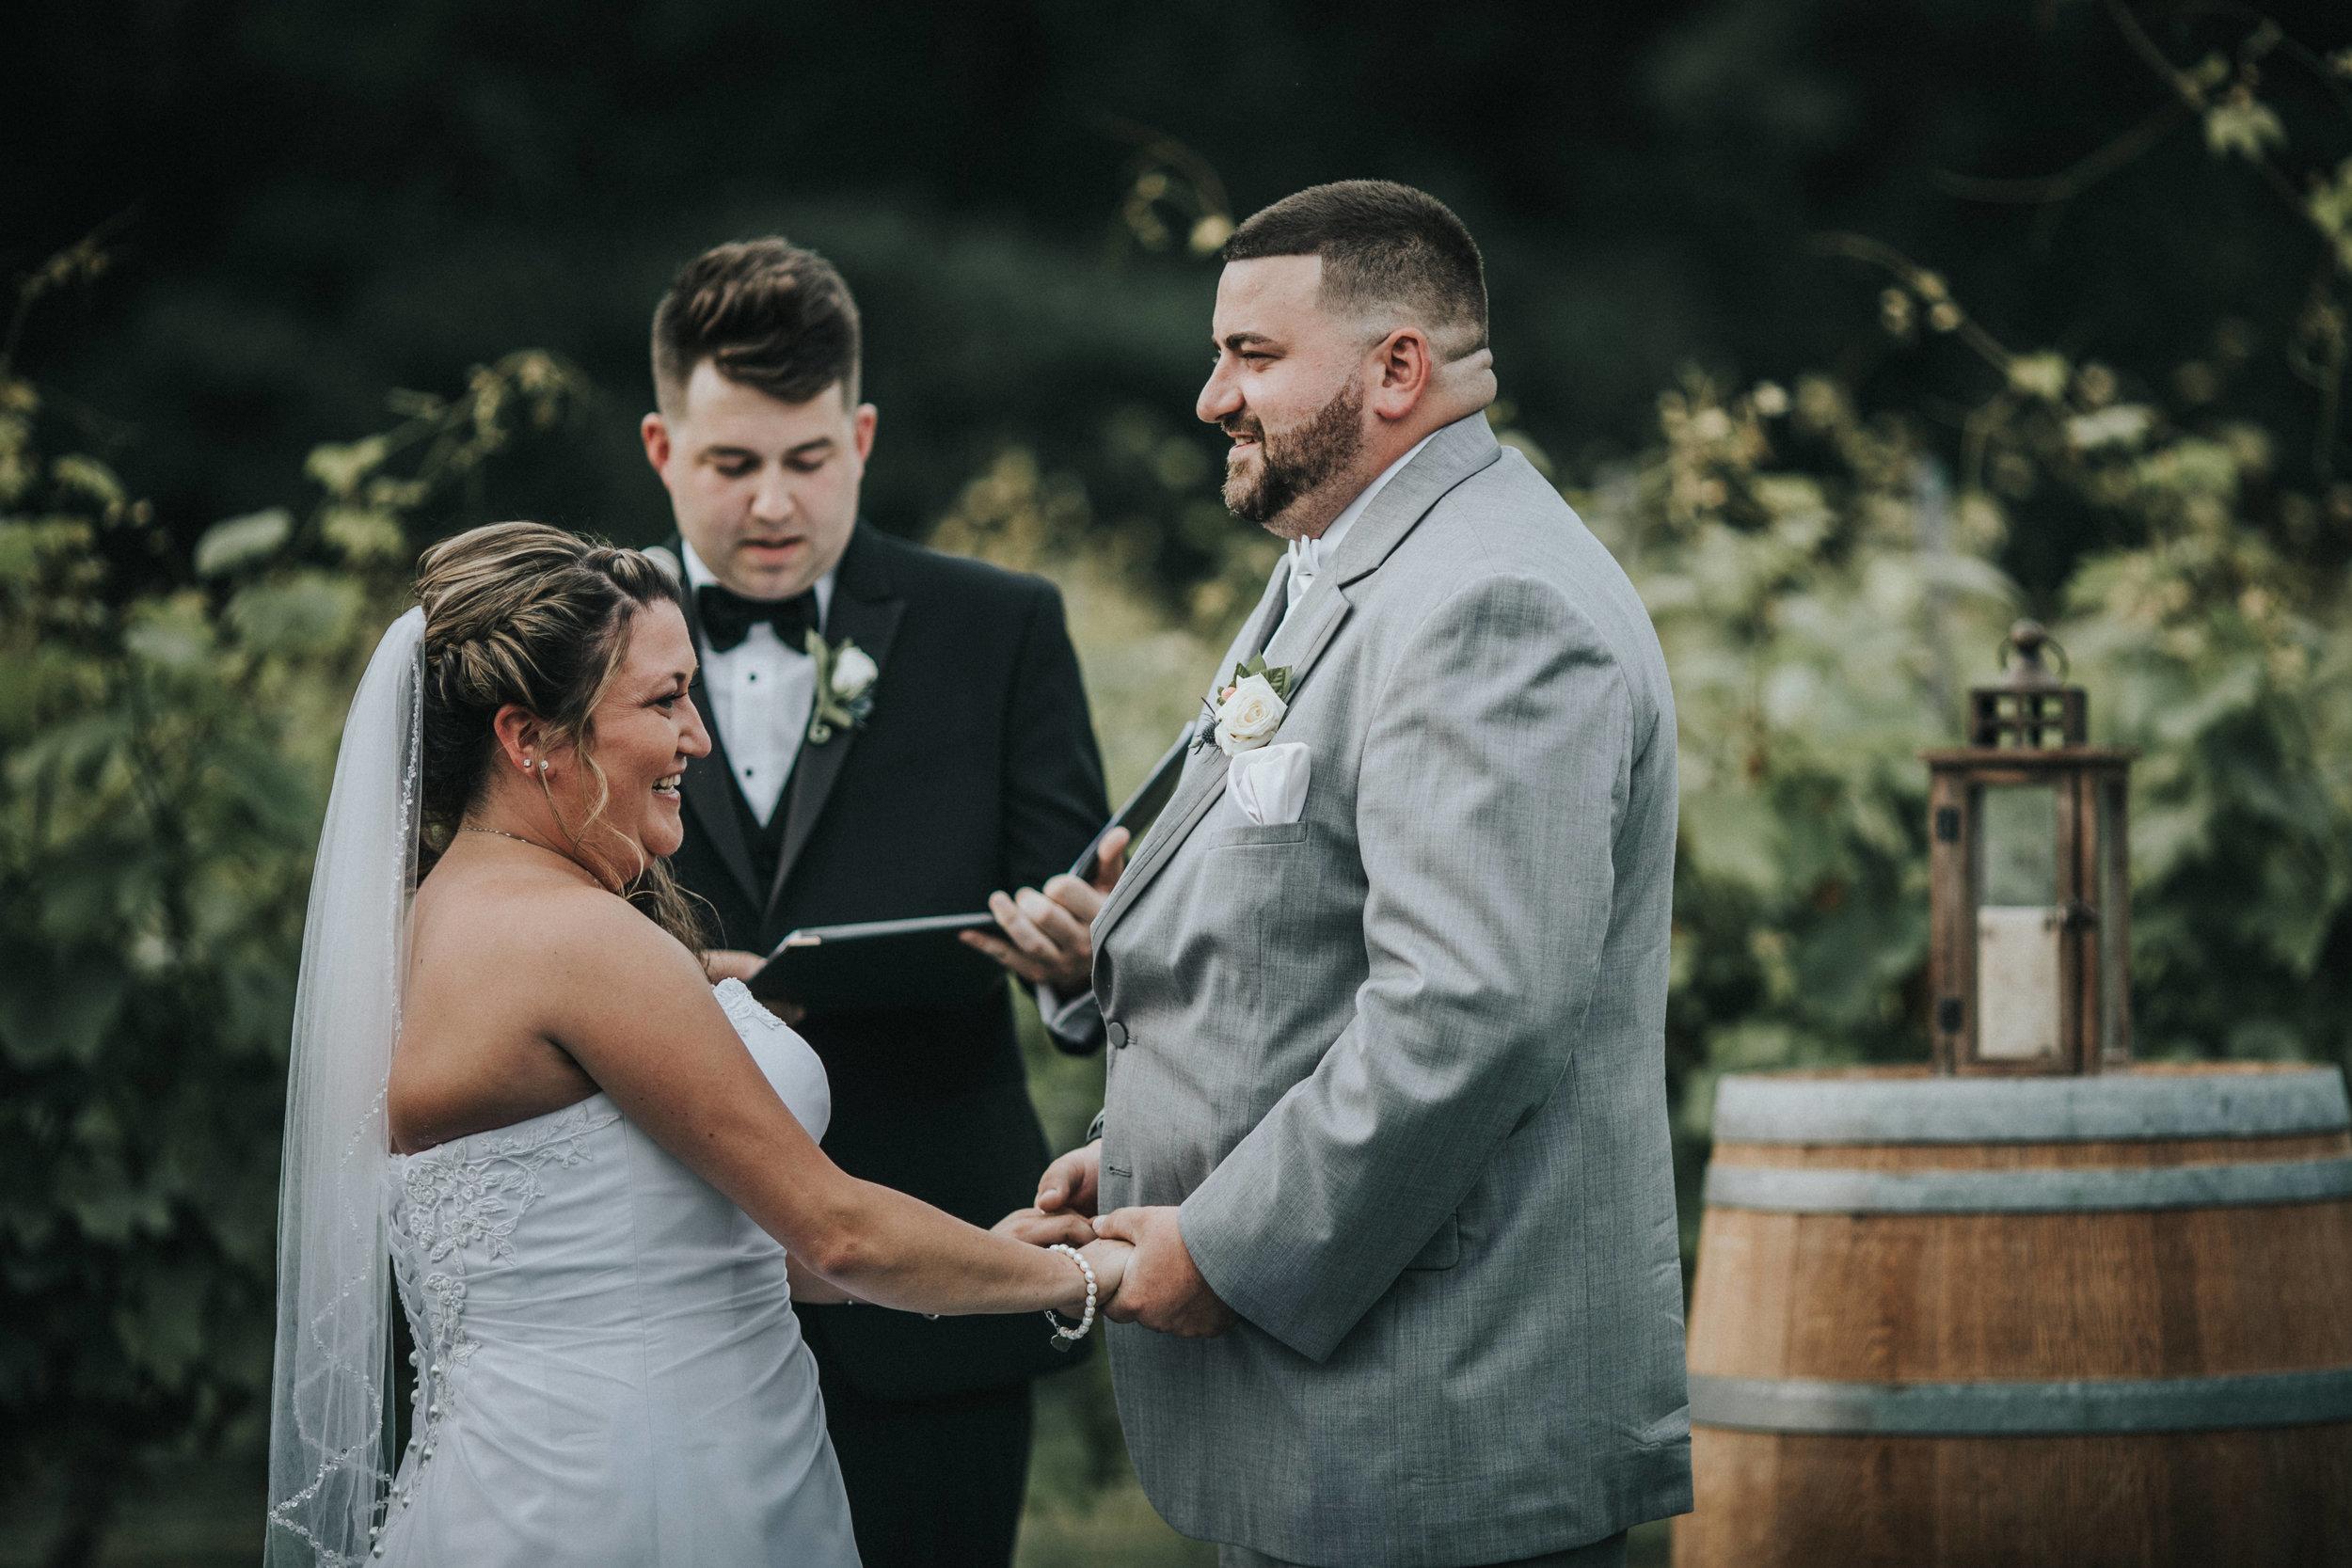 New-Jersey-Wedding-Photographer-JennaLynnPhotography-ValenzanoWinery-Ceremony-62.jpg